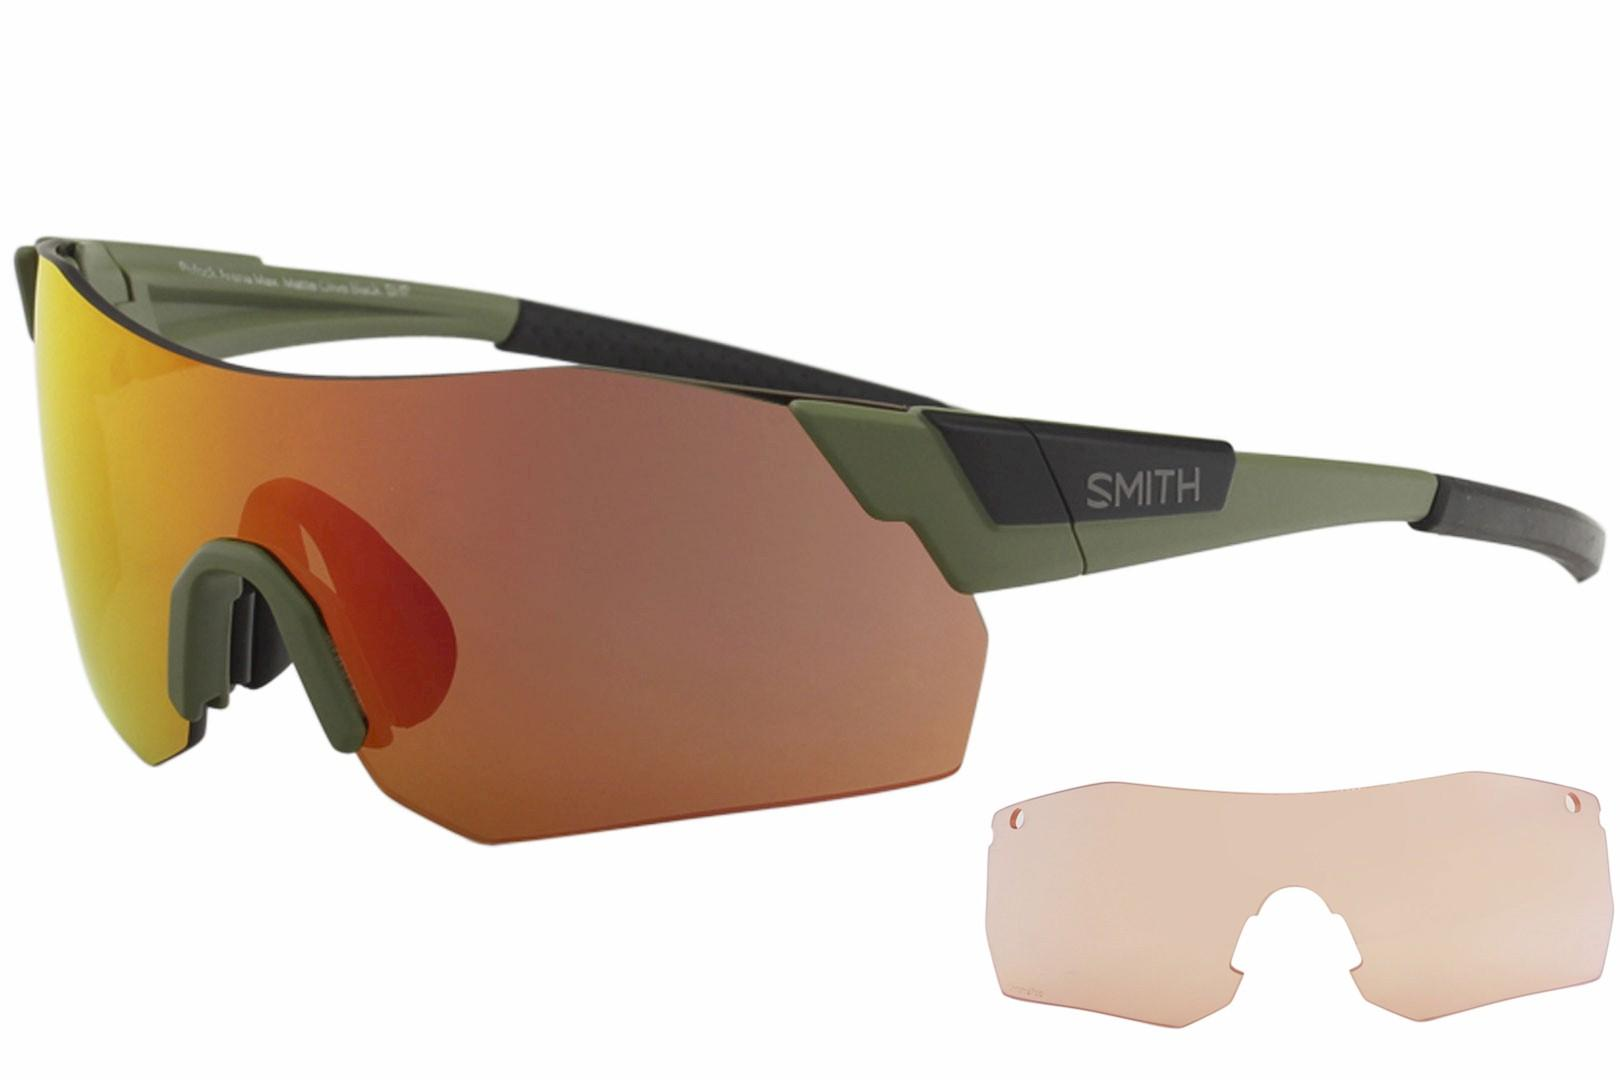 33d68b3d5771 Smith Optics Pivlock Arena Max X6 Fashion Shield Sunglasses